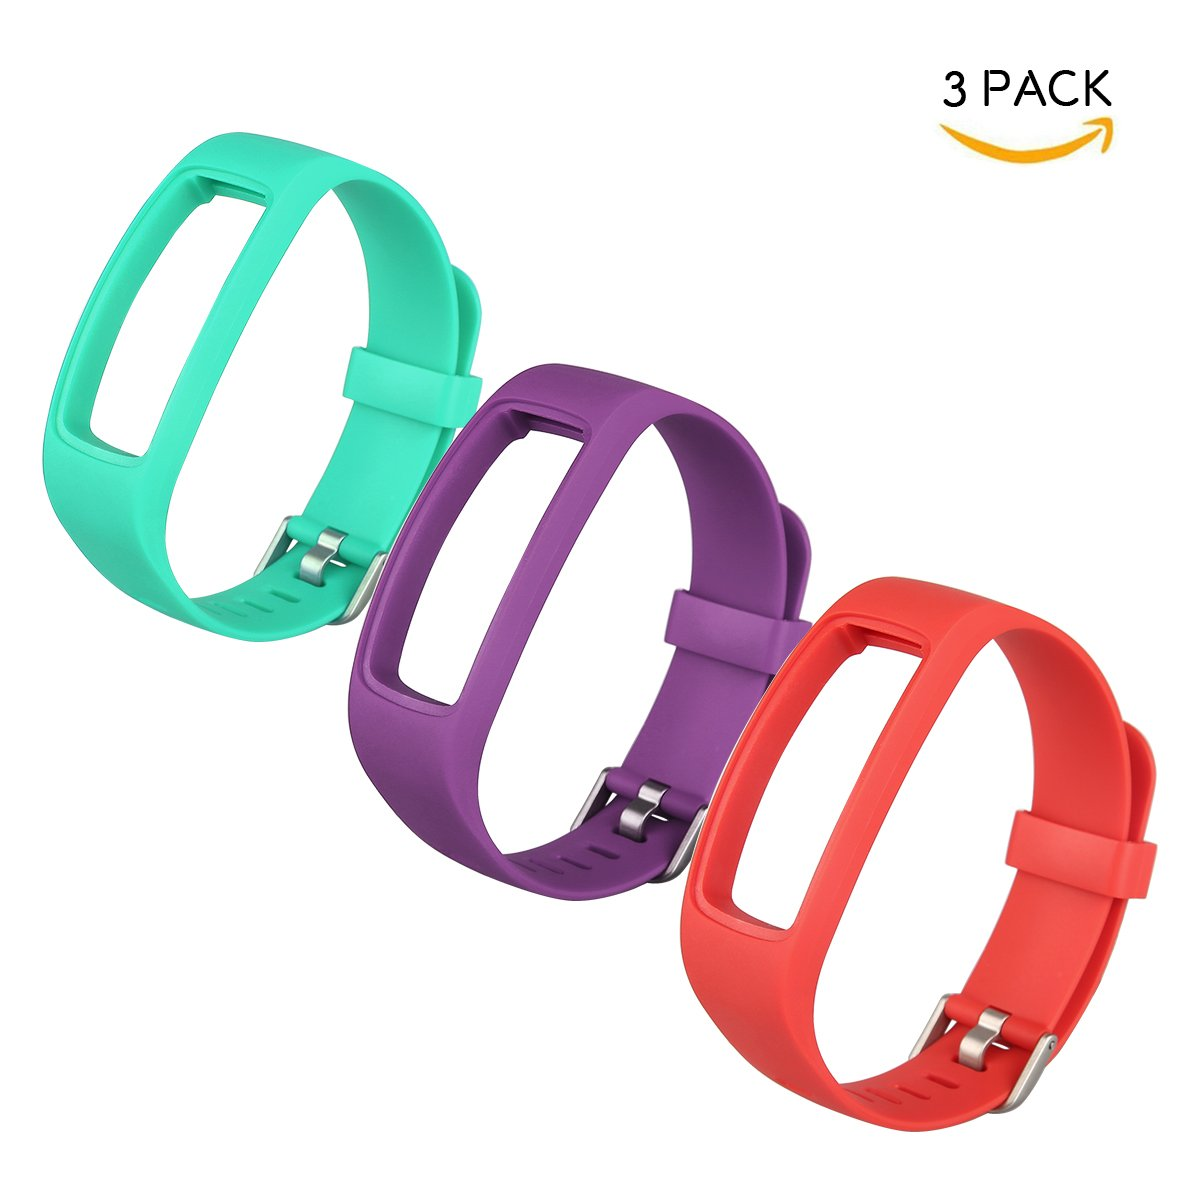 Reemplazable reloj banda para bonebit V2 Fitness Tracker reloj pulsómetro con cierre con hebilla de metal azul & negro (no incluye bonebit V2 Fitness ...